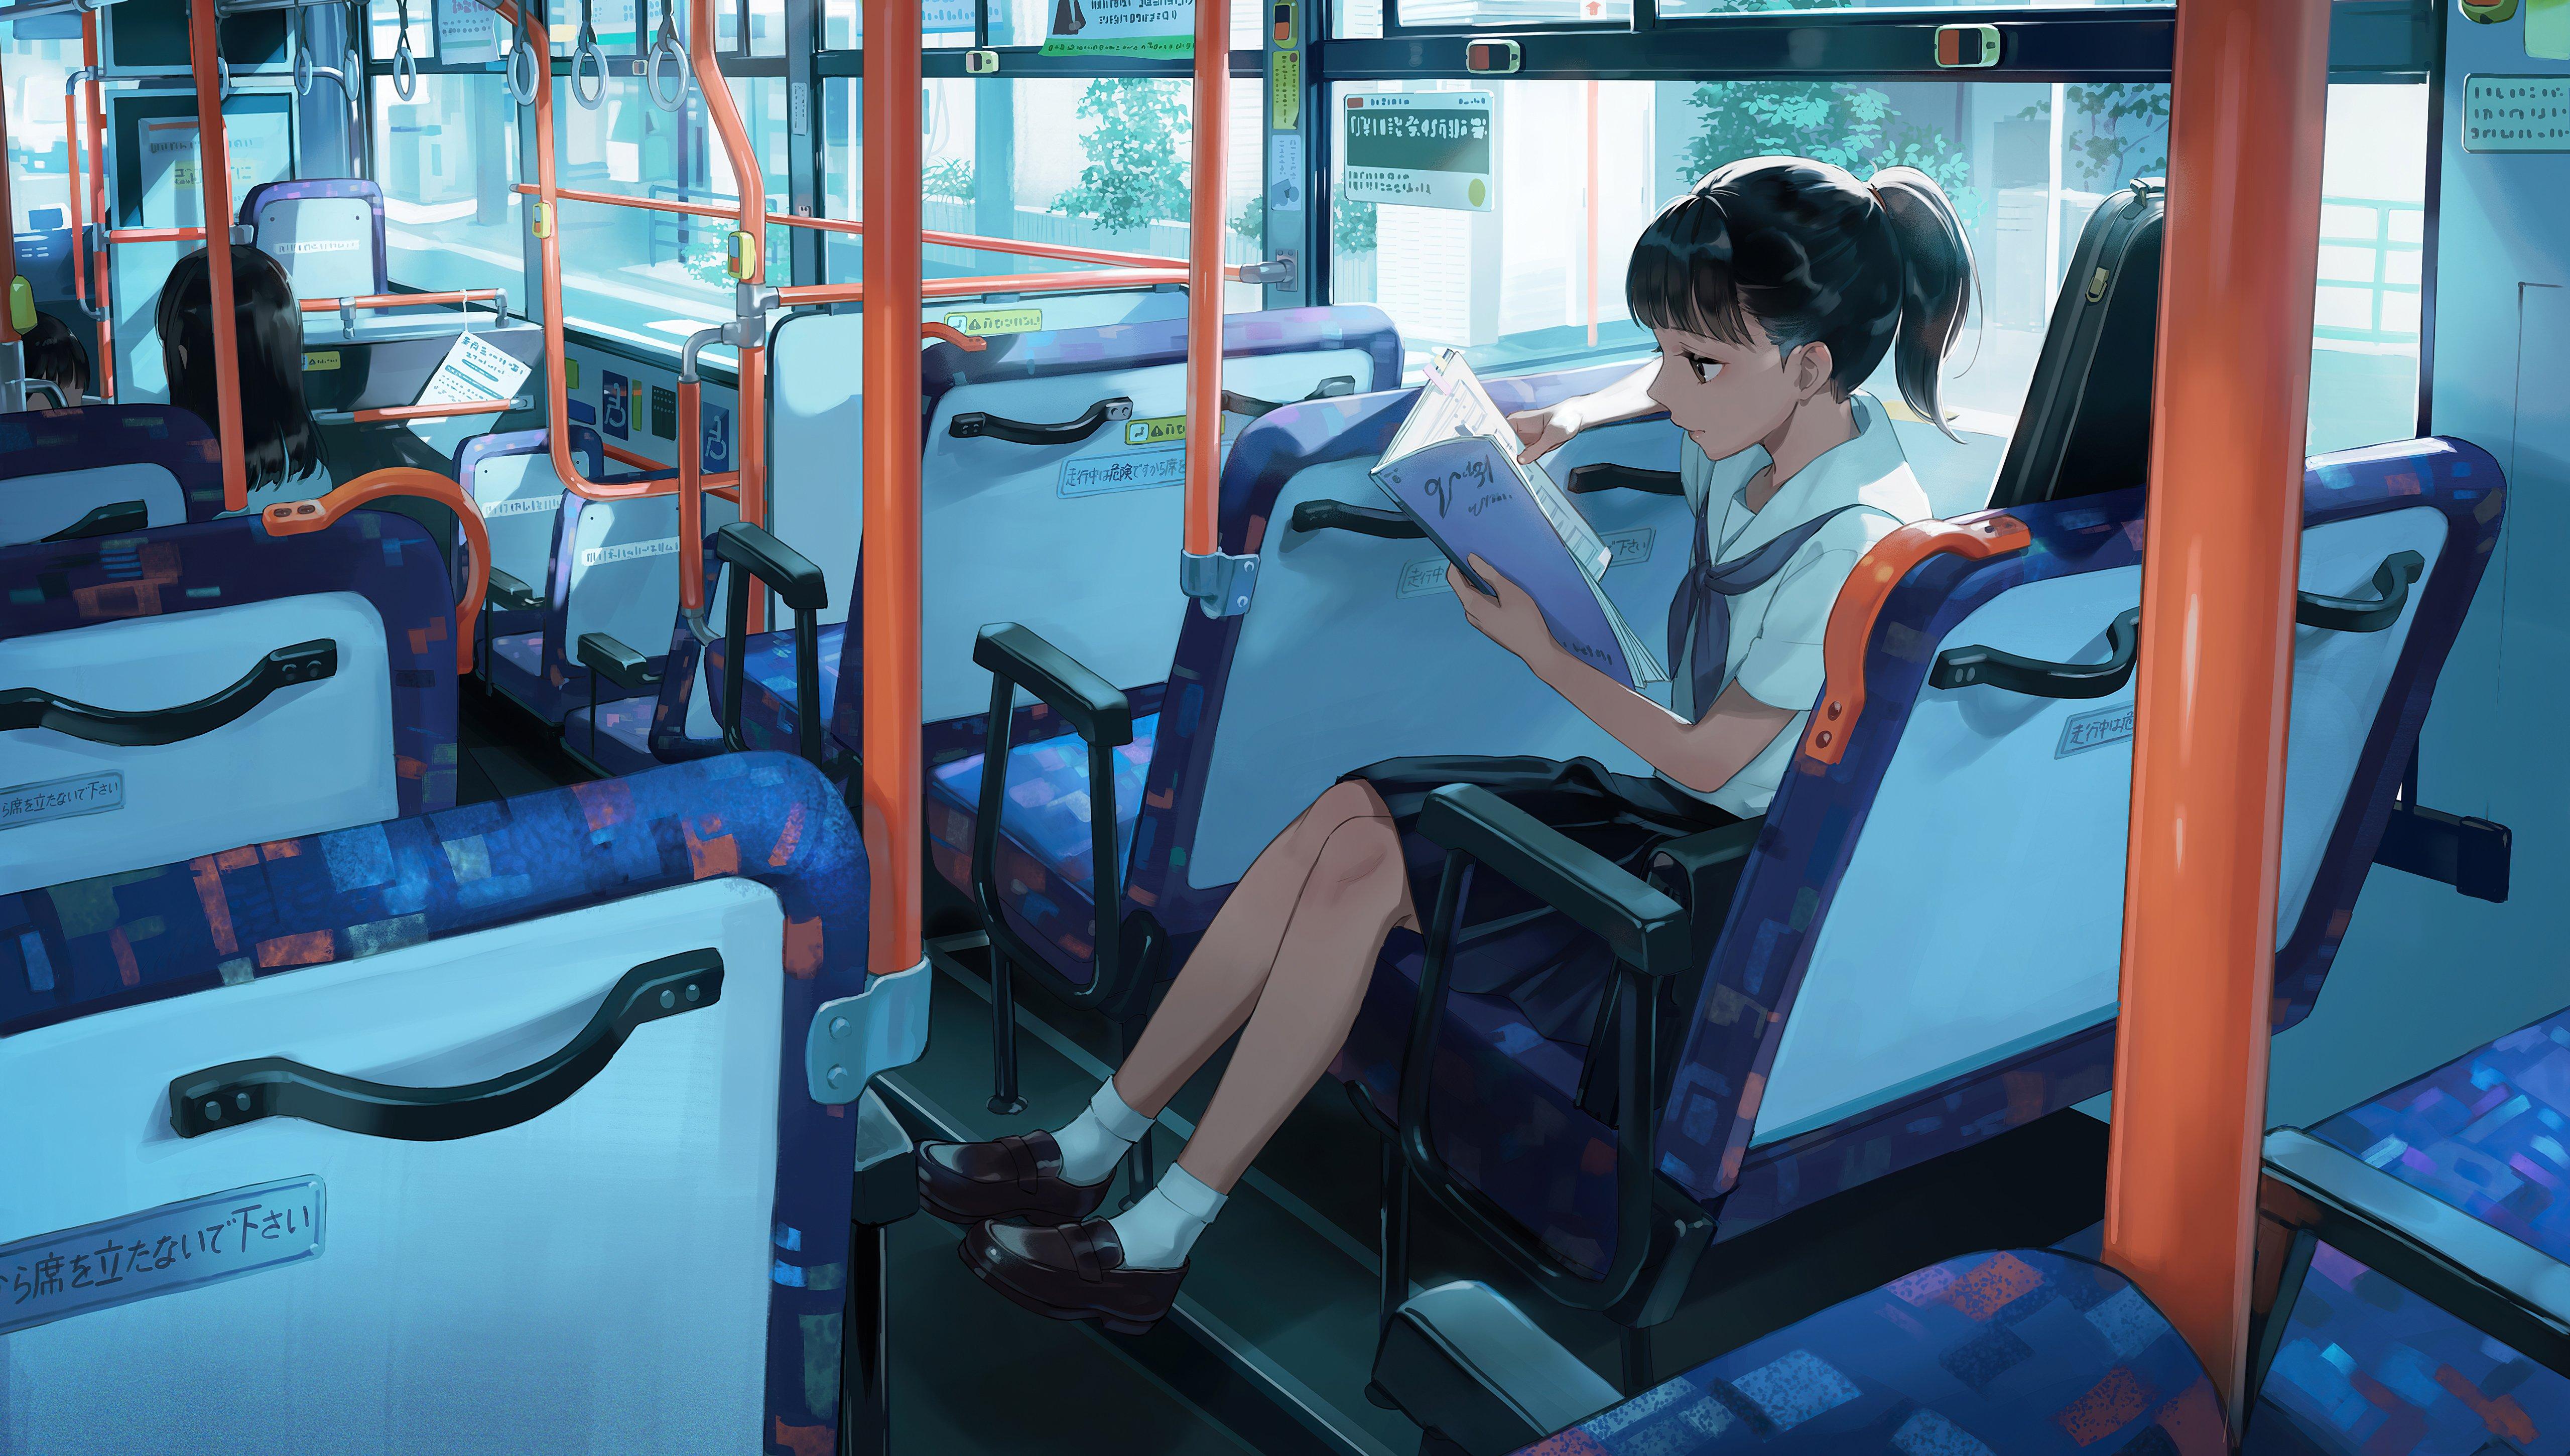 Fondos de pantalla Anime Estudiante en bus leyendo